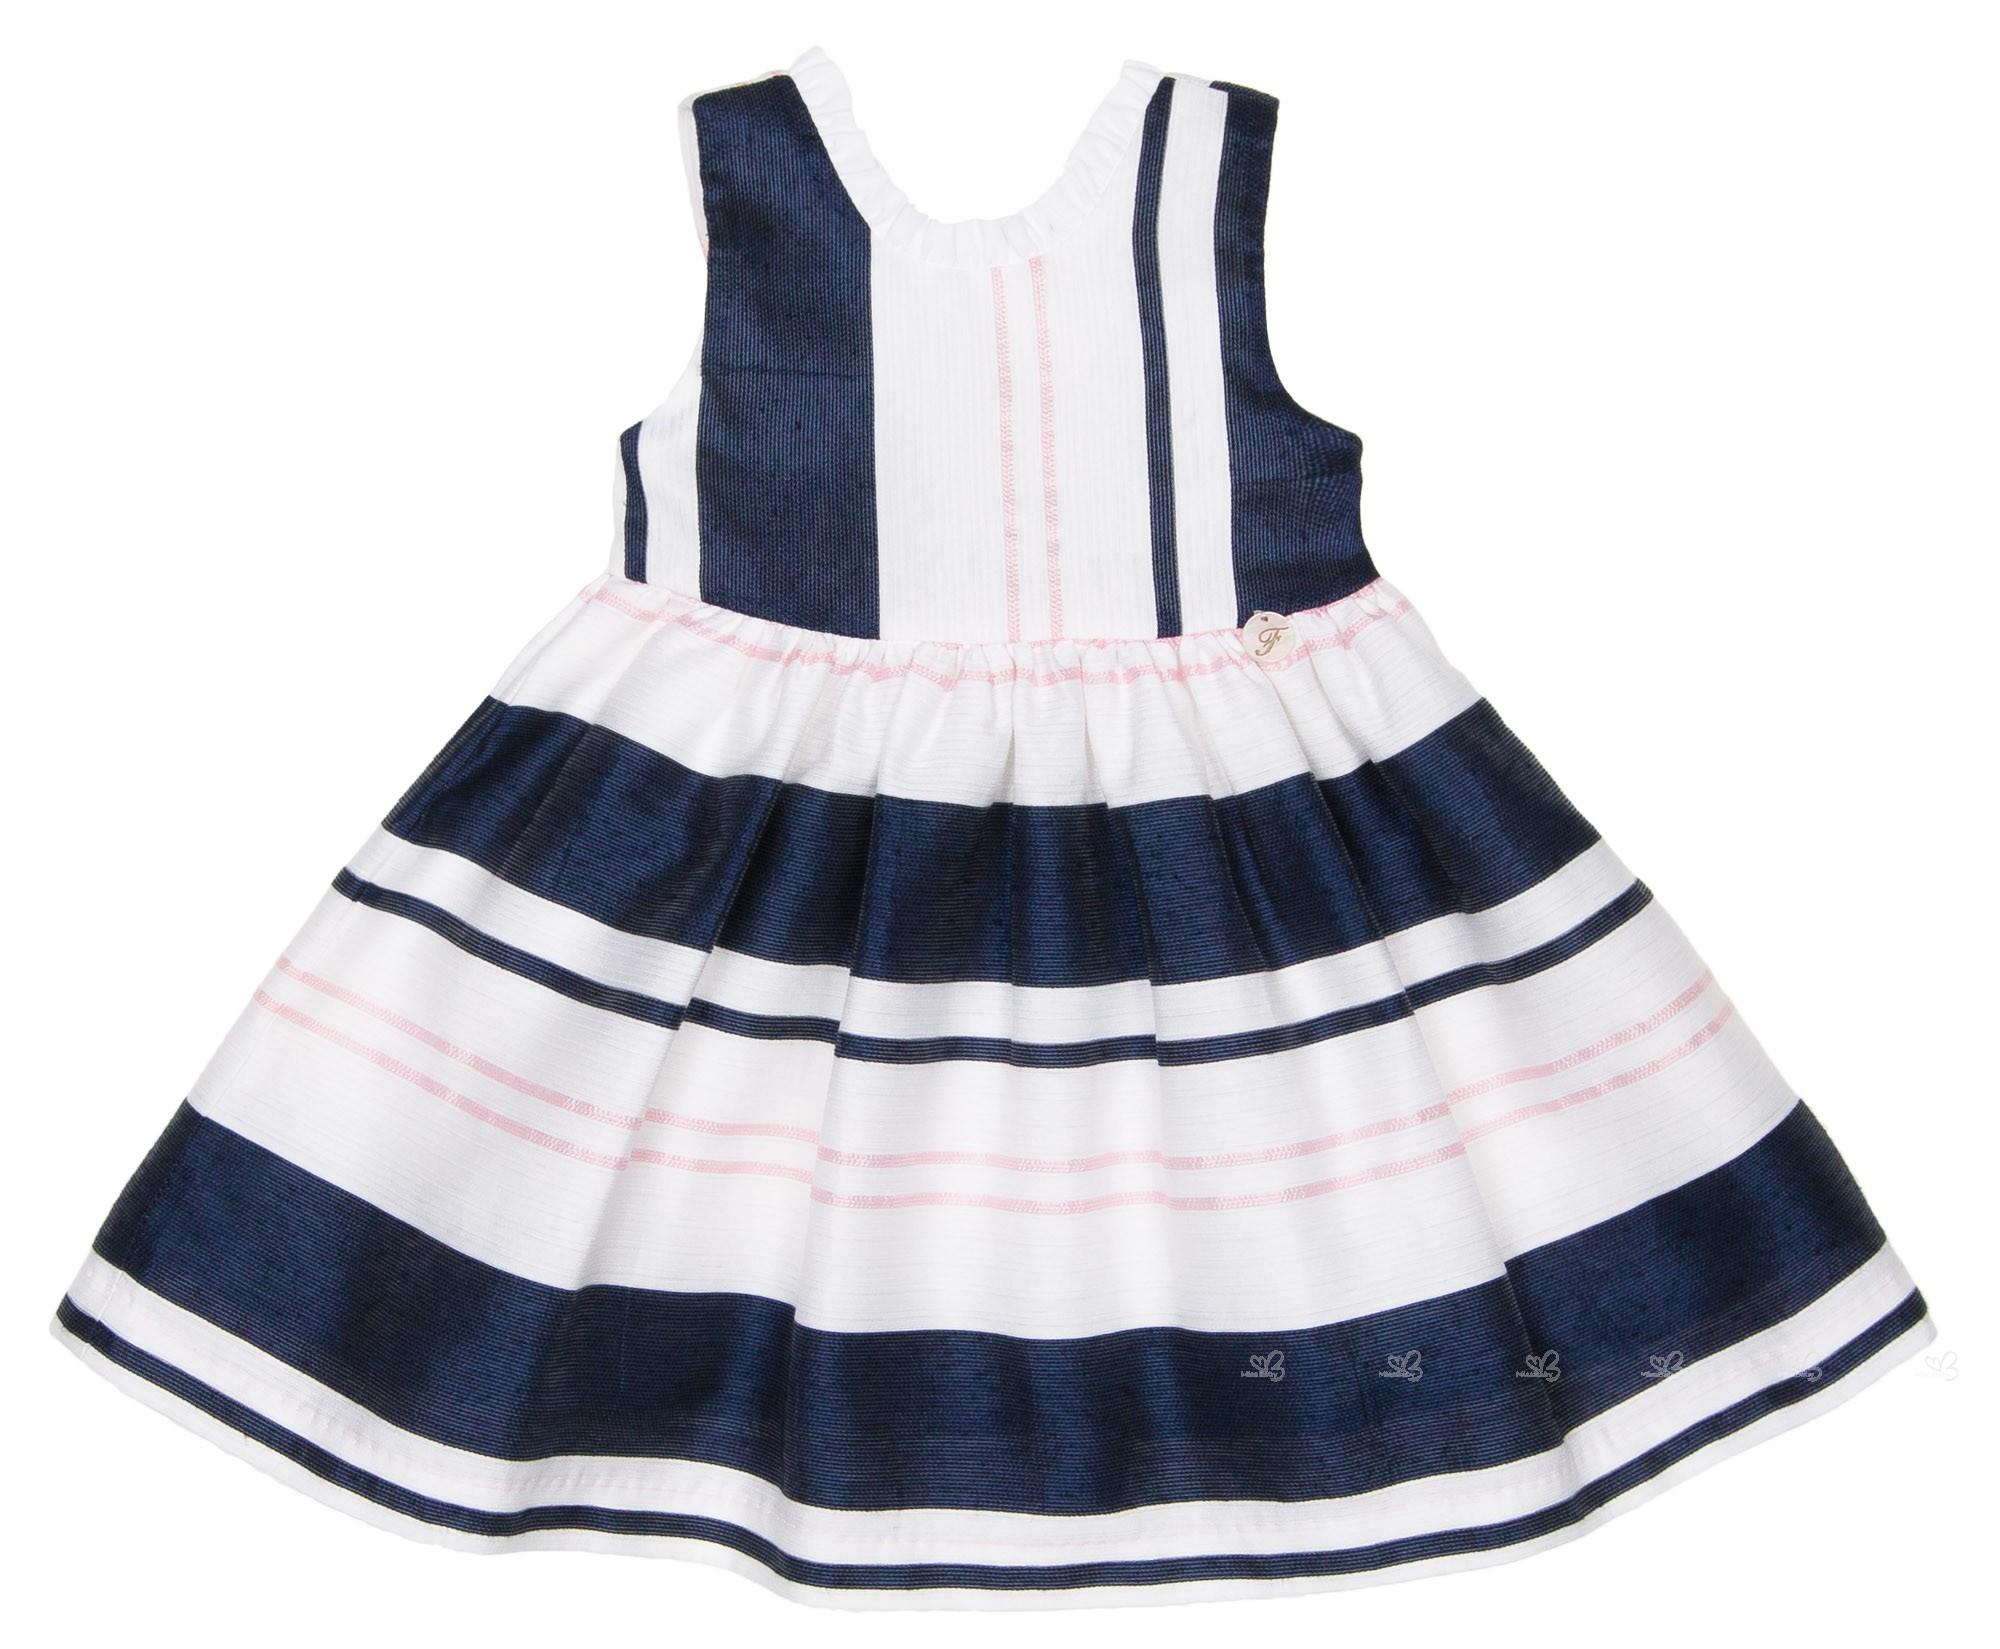 6b8f3351f Foque Girls Navy Blue   White Striped Dress